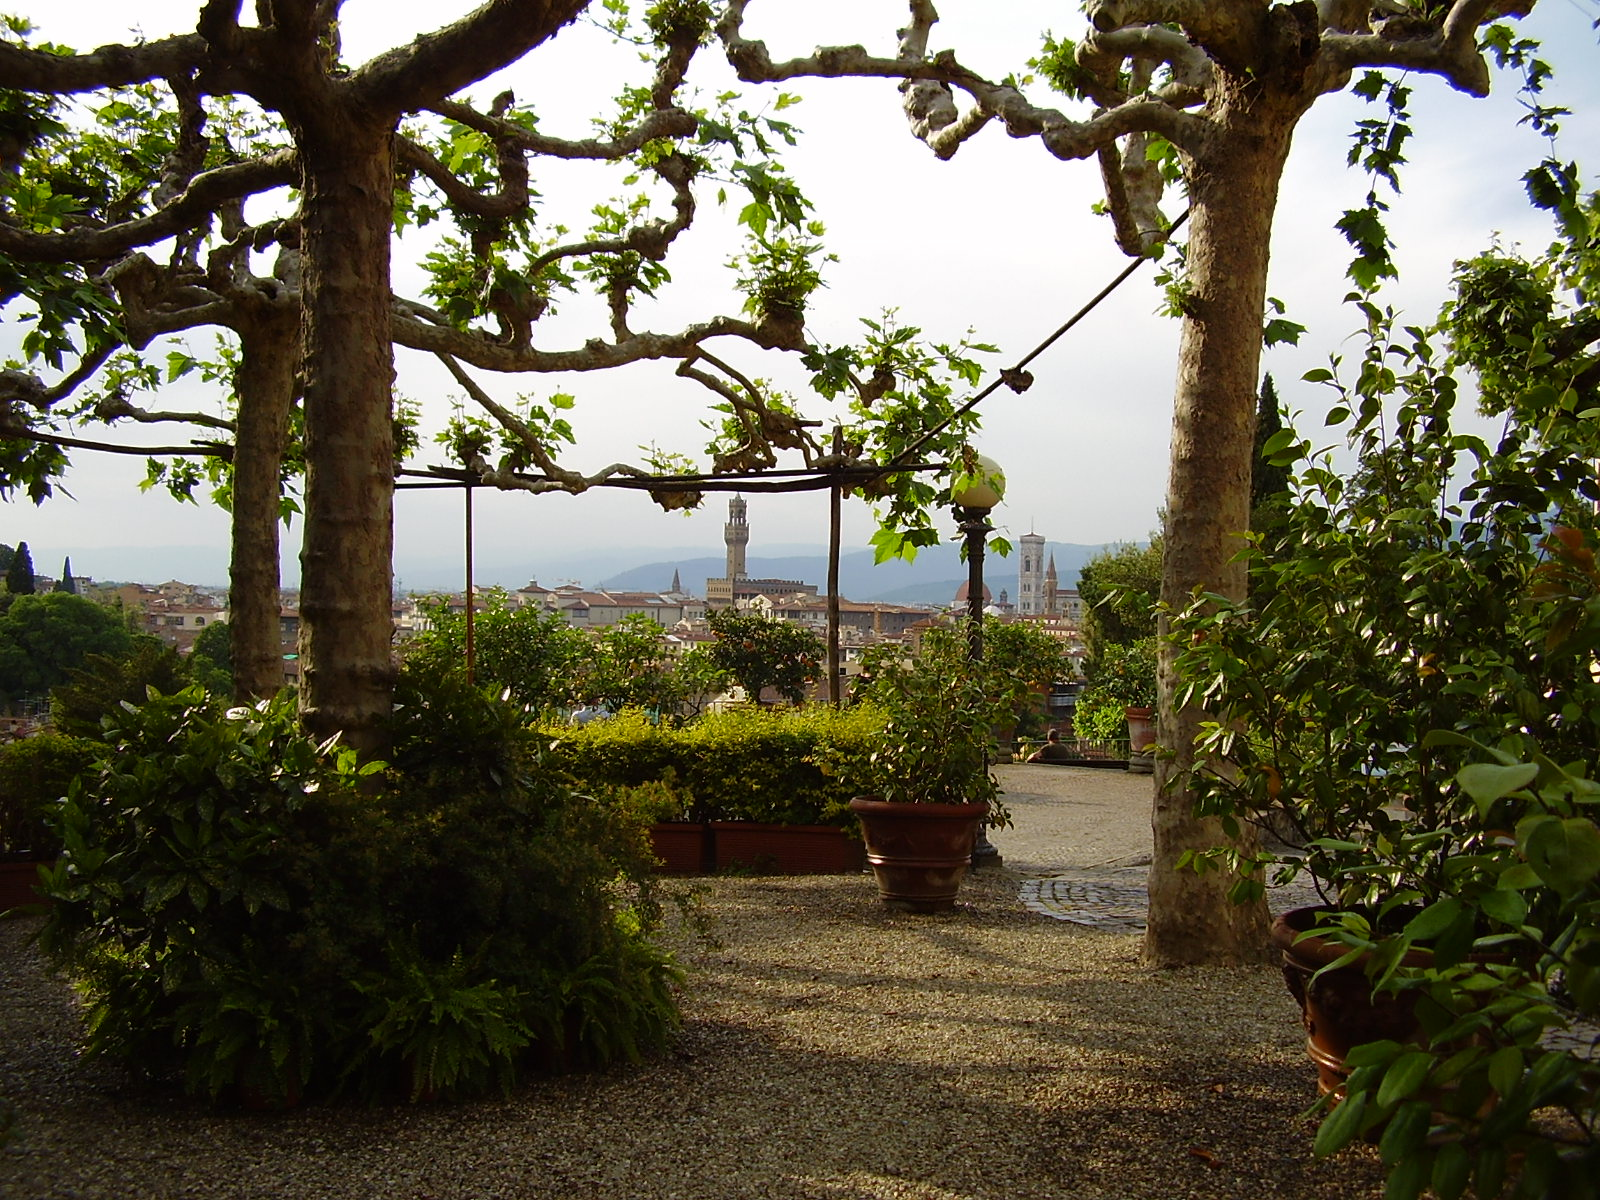 giardino-delle-rose-4